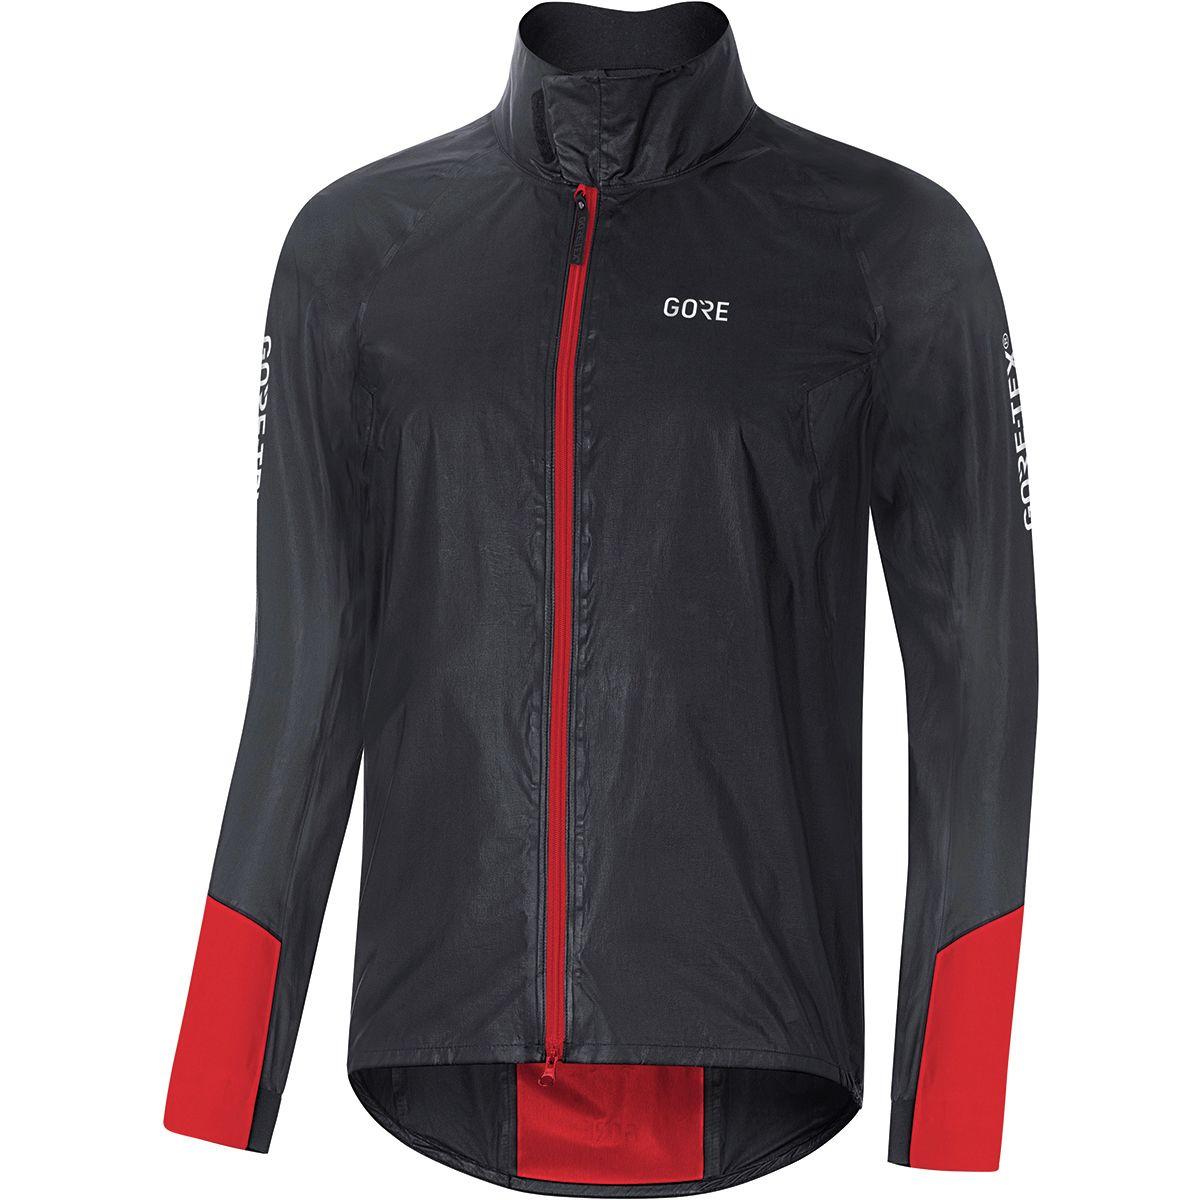 Altura Mayhem 2 Waterproof Mens Cycling Jacket Sporting Goods Grey